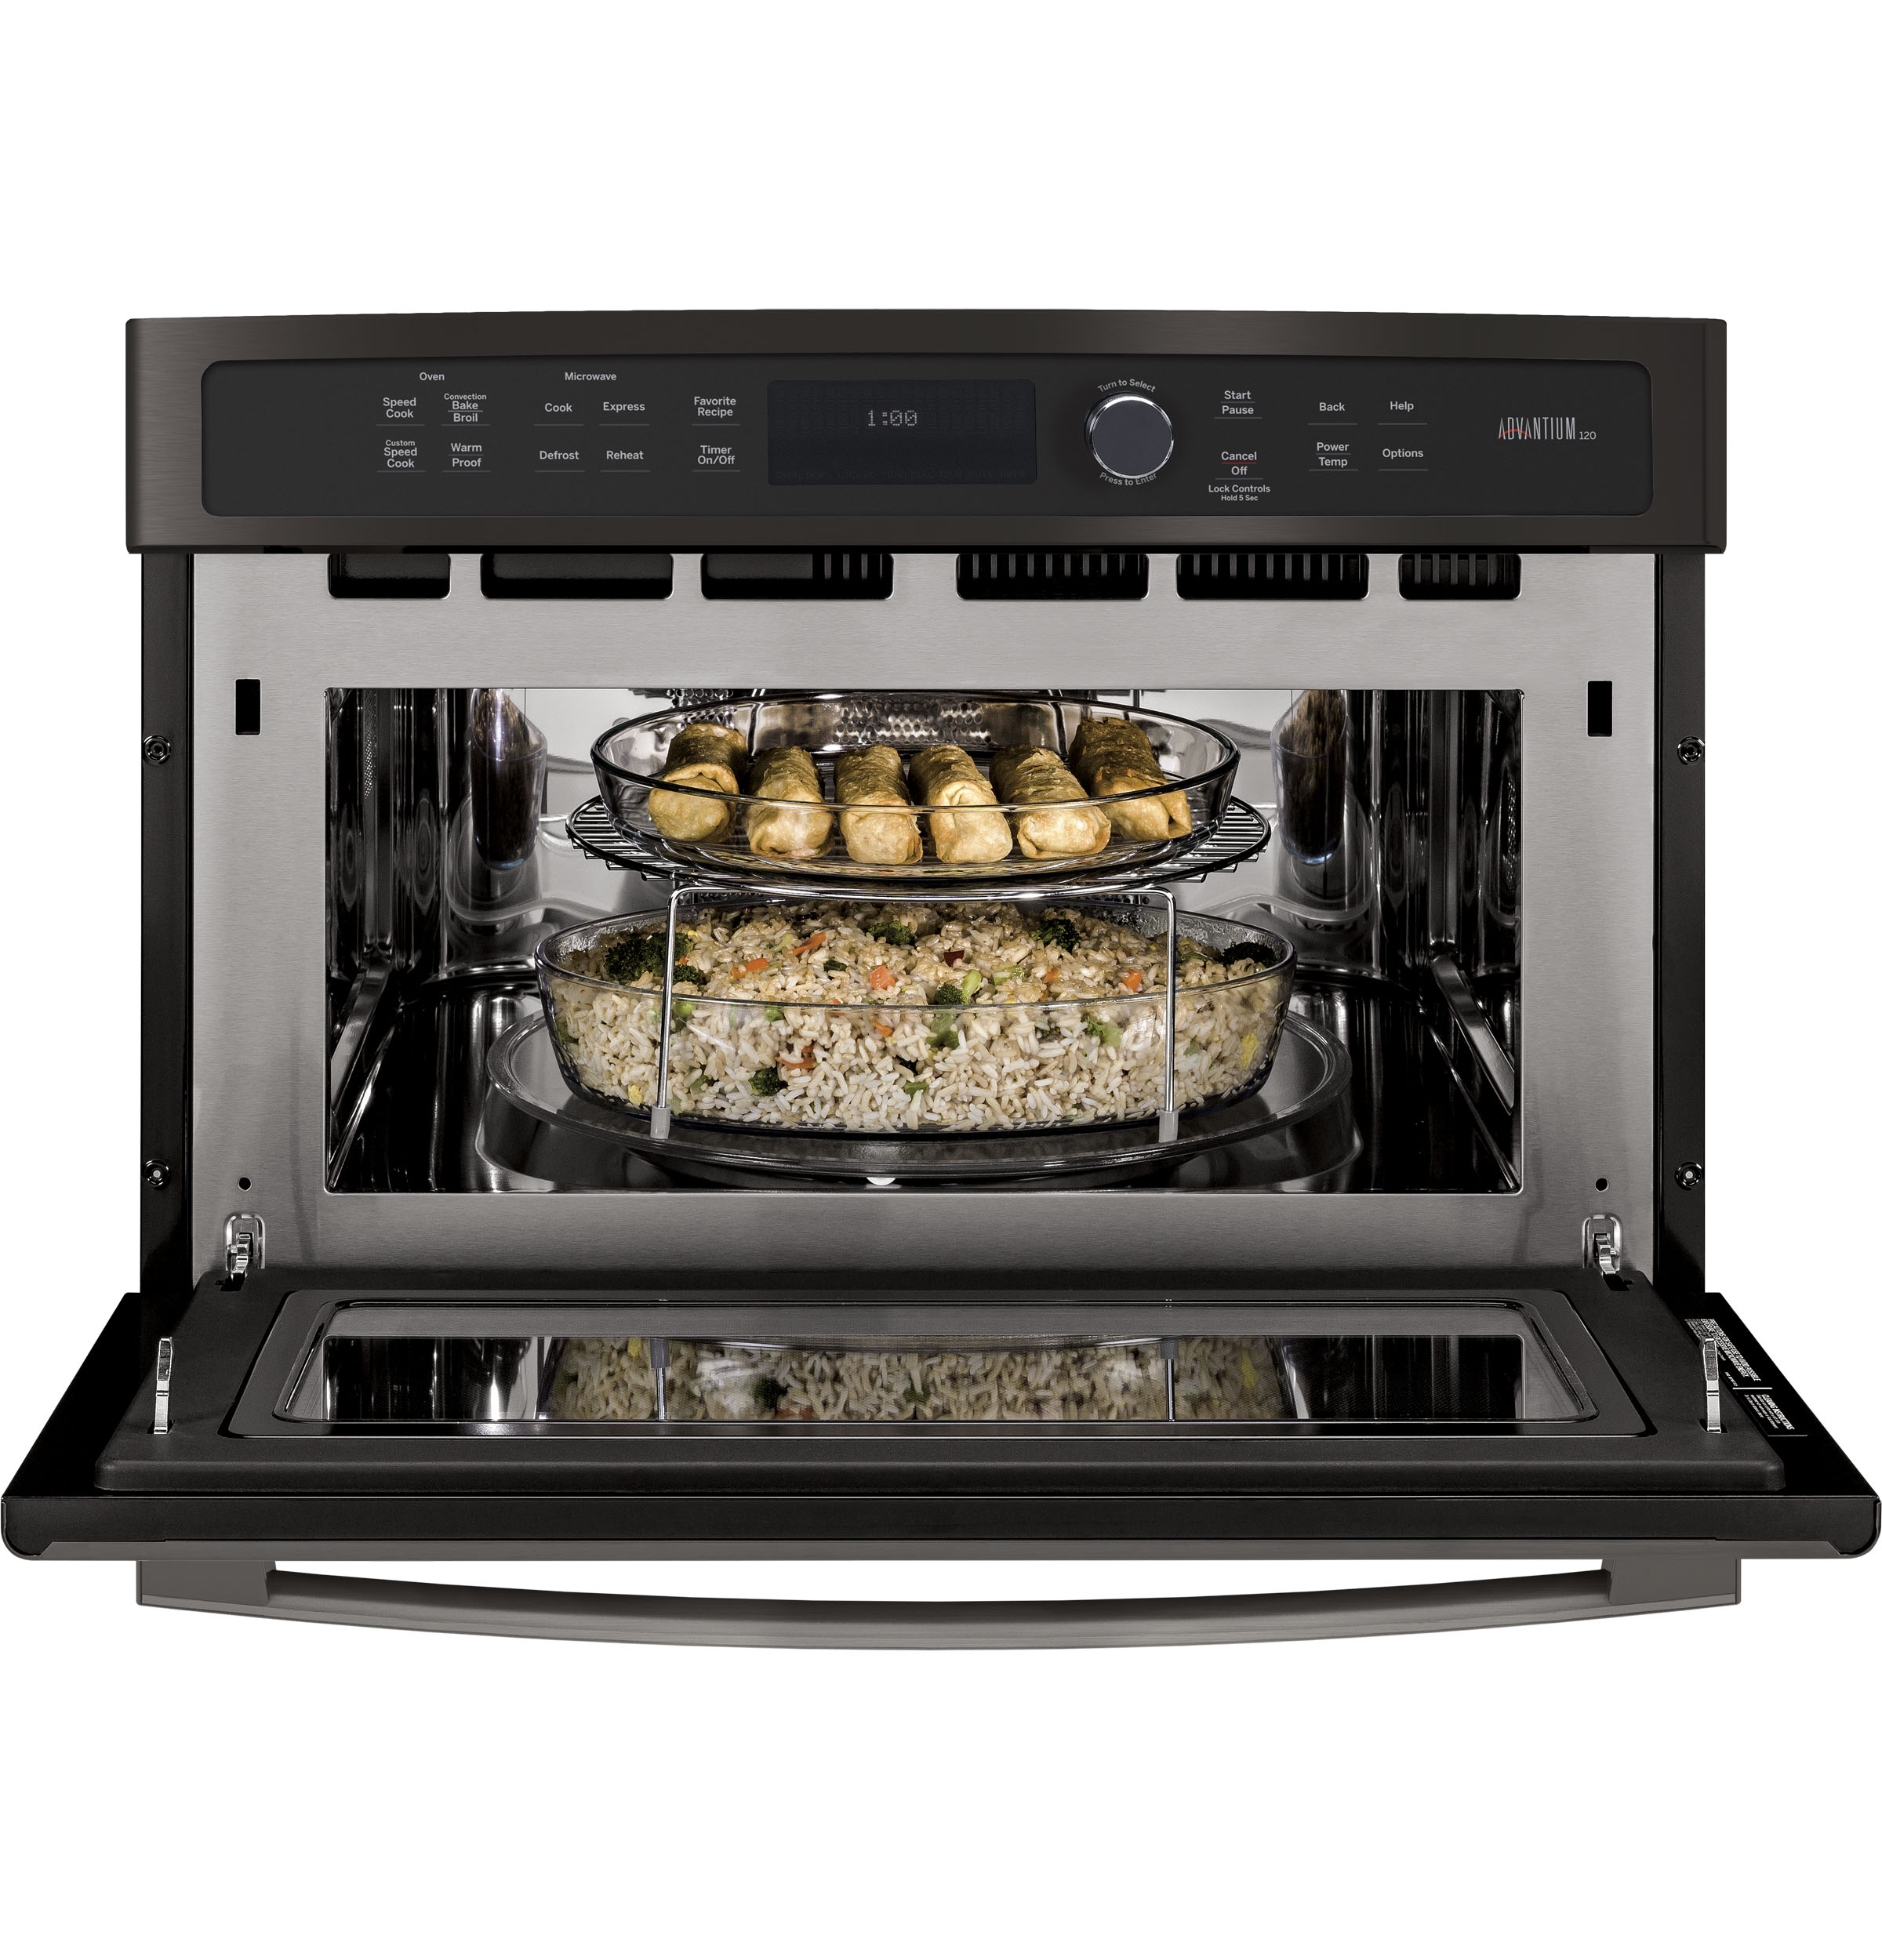 Model: PSB9100BLTS | GE Profile GE Profile™ 27 in. Single Wall Oven Advantium® Technology